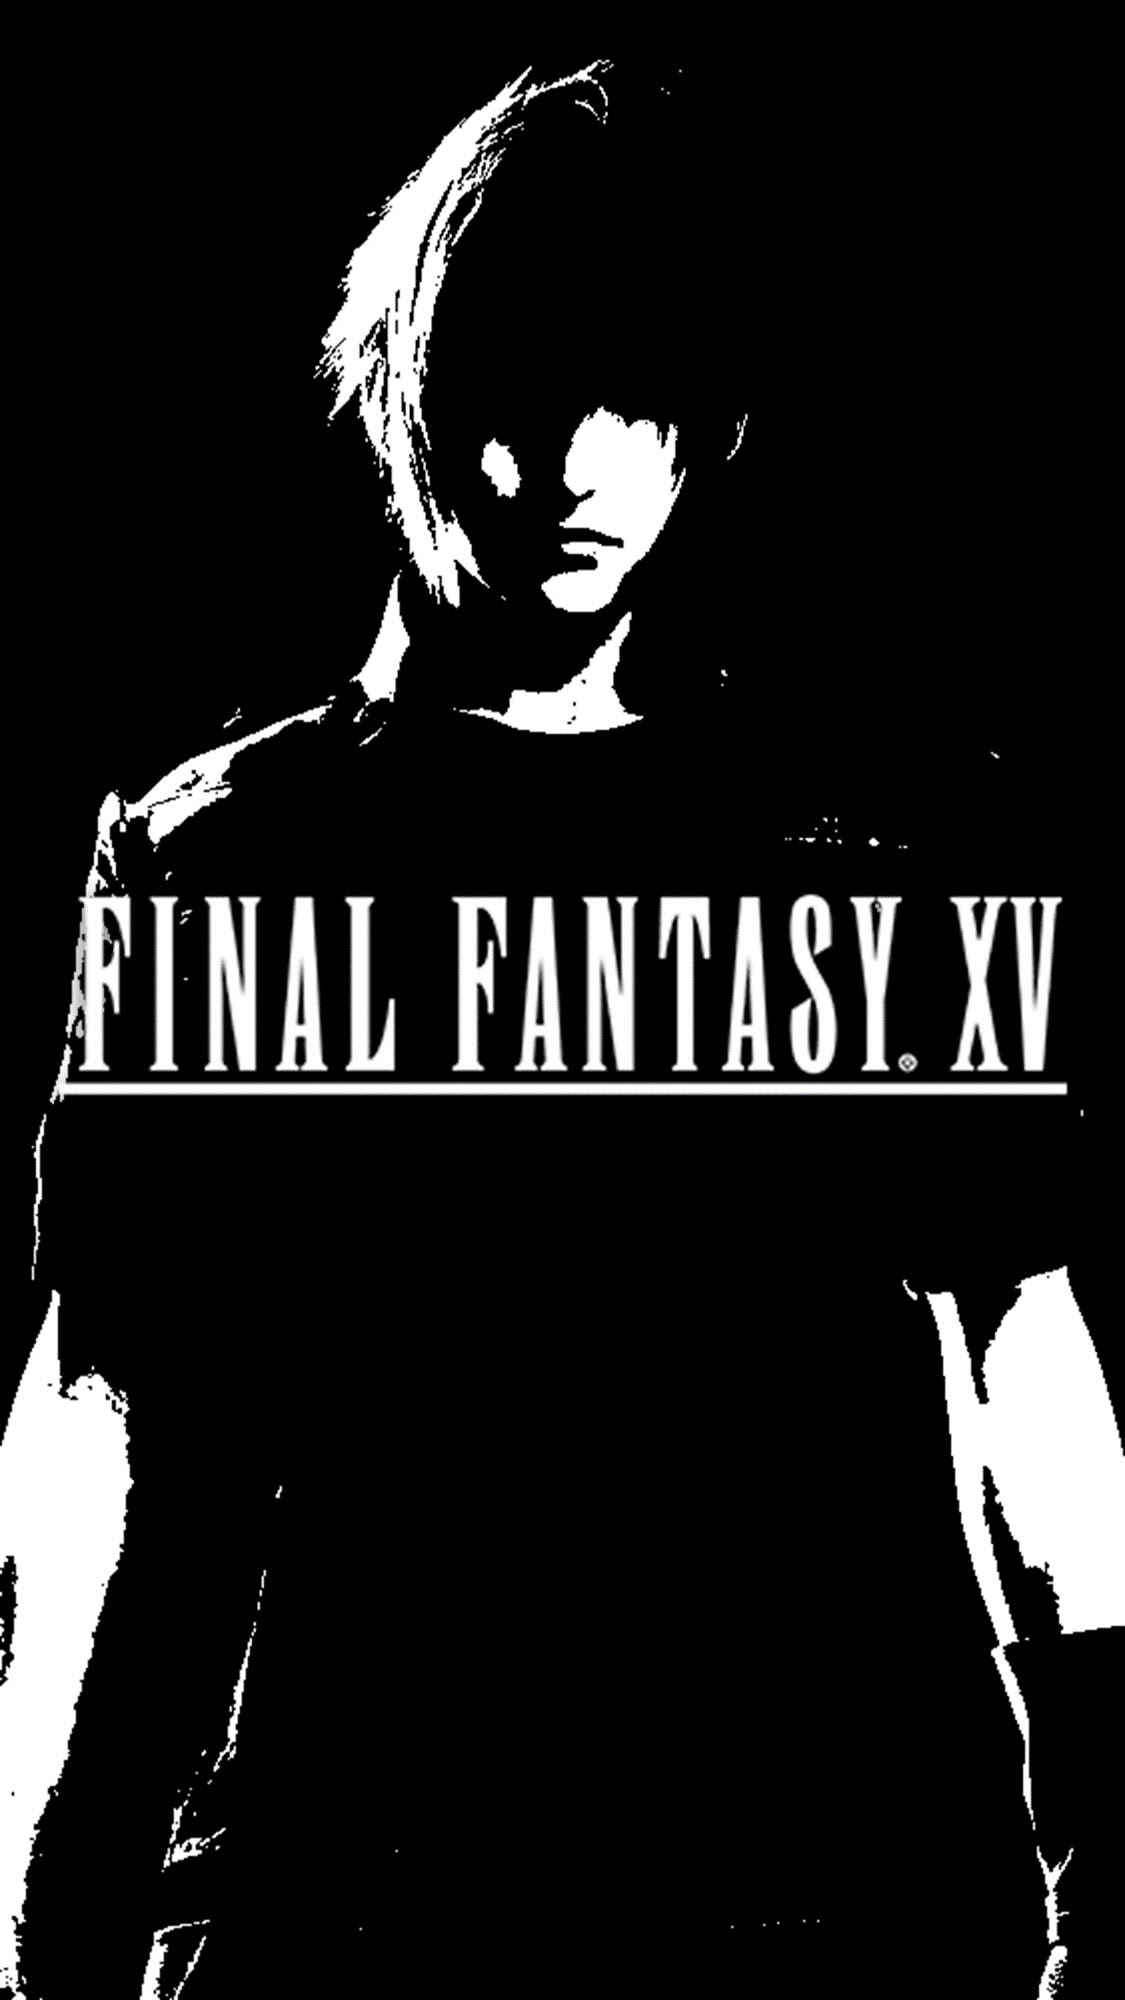 Final Fantasy Xv Wallpaper 78 Images